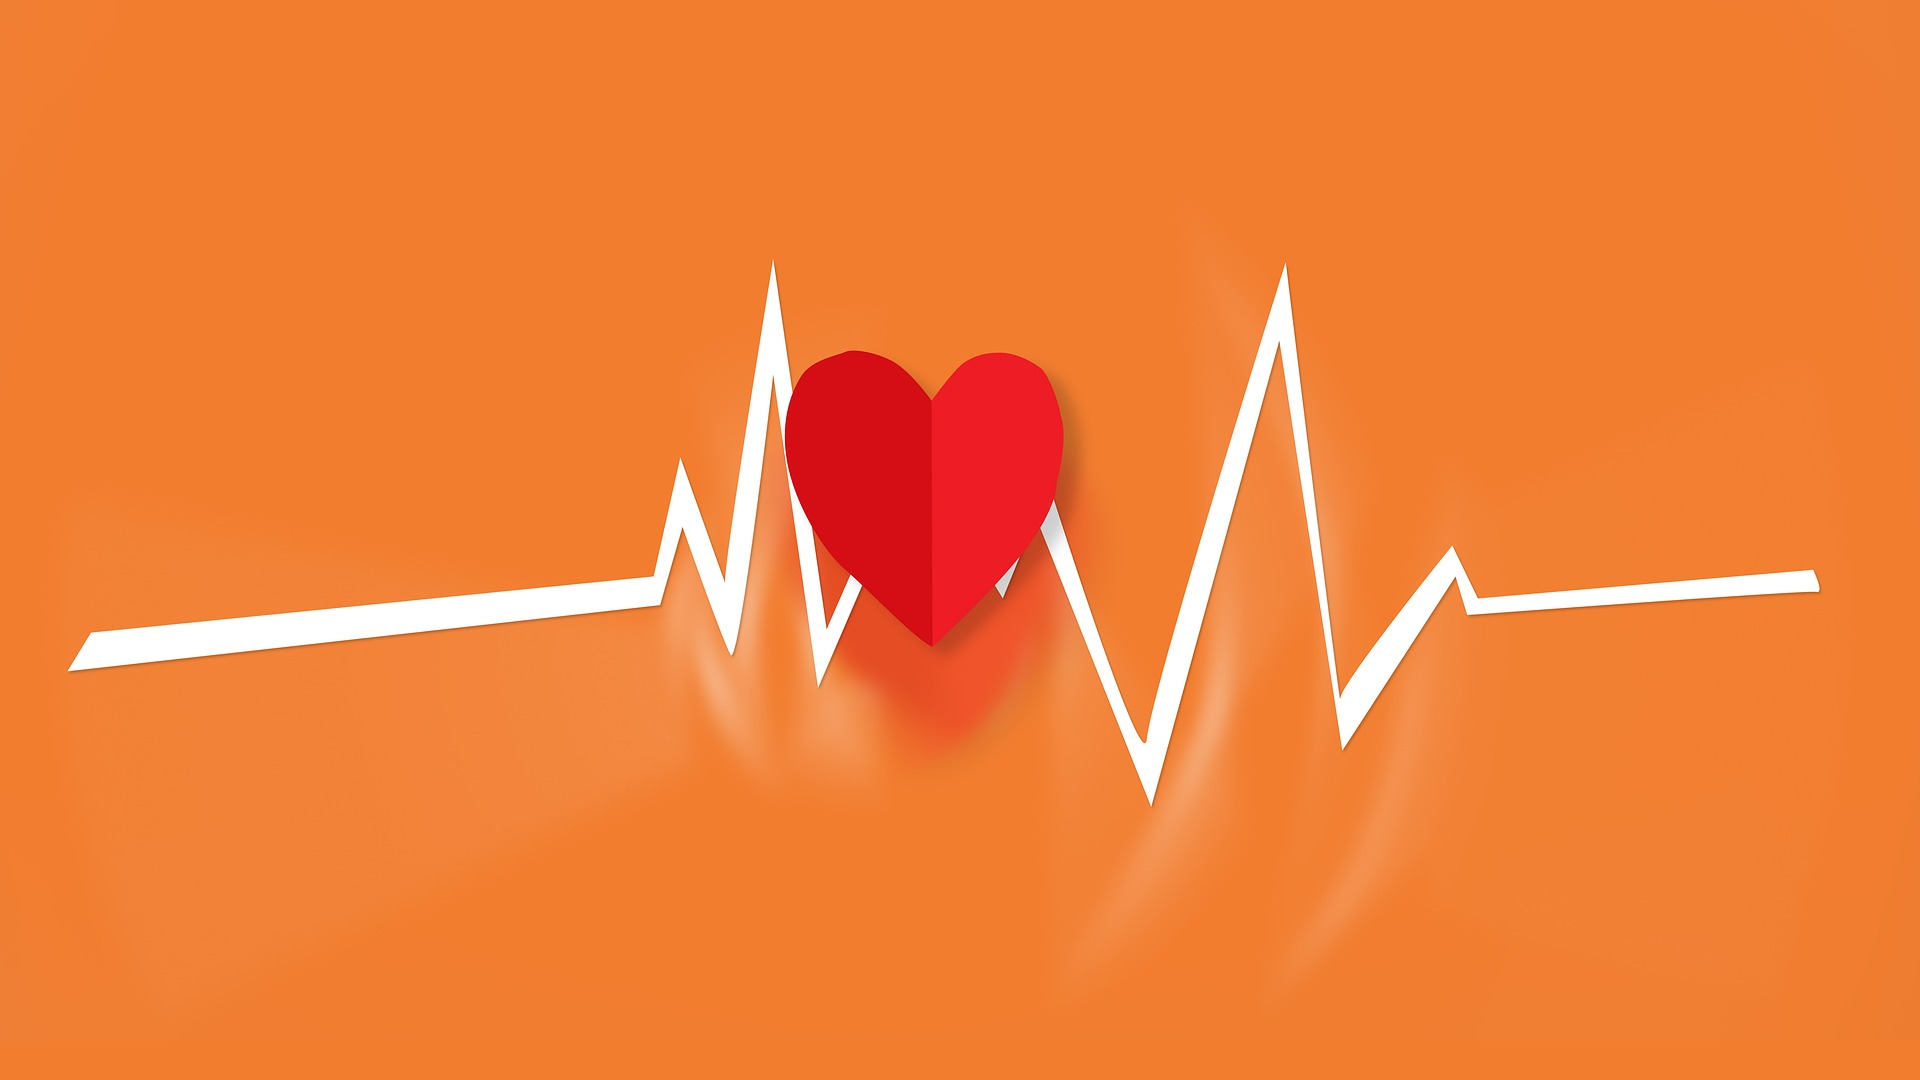 Hjärtsvikt